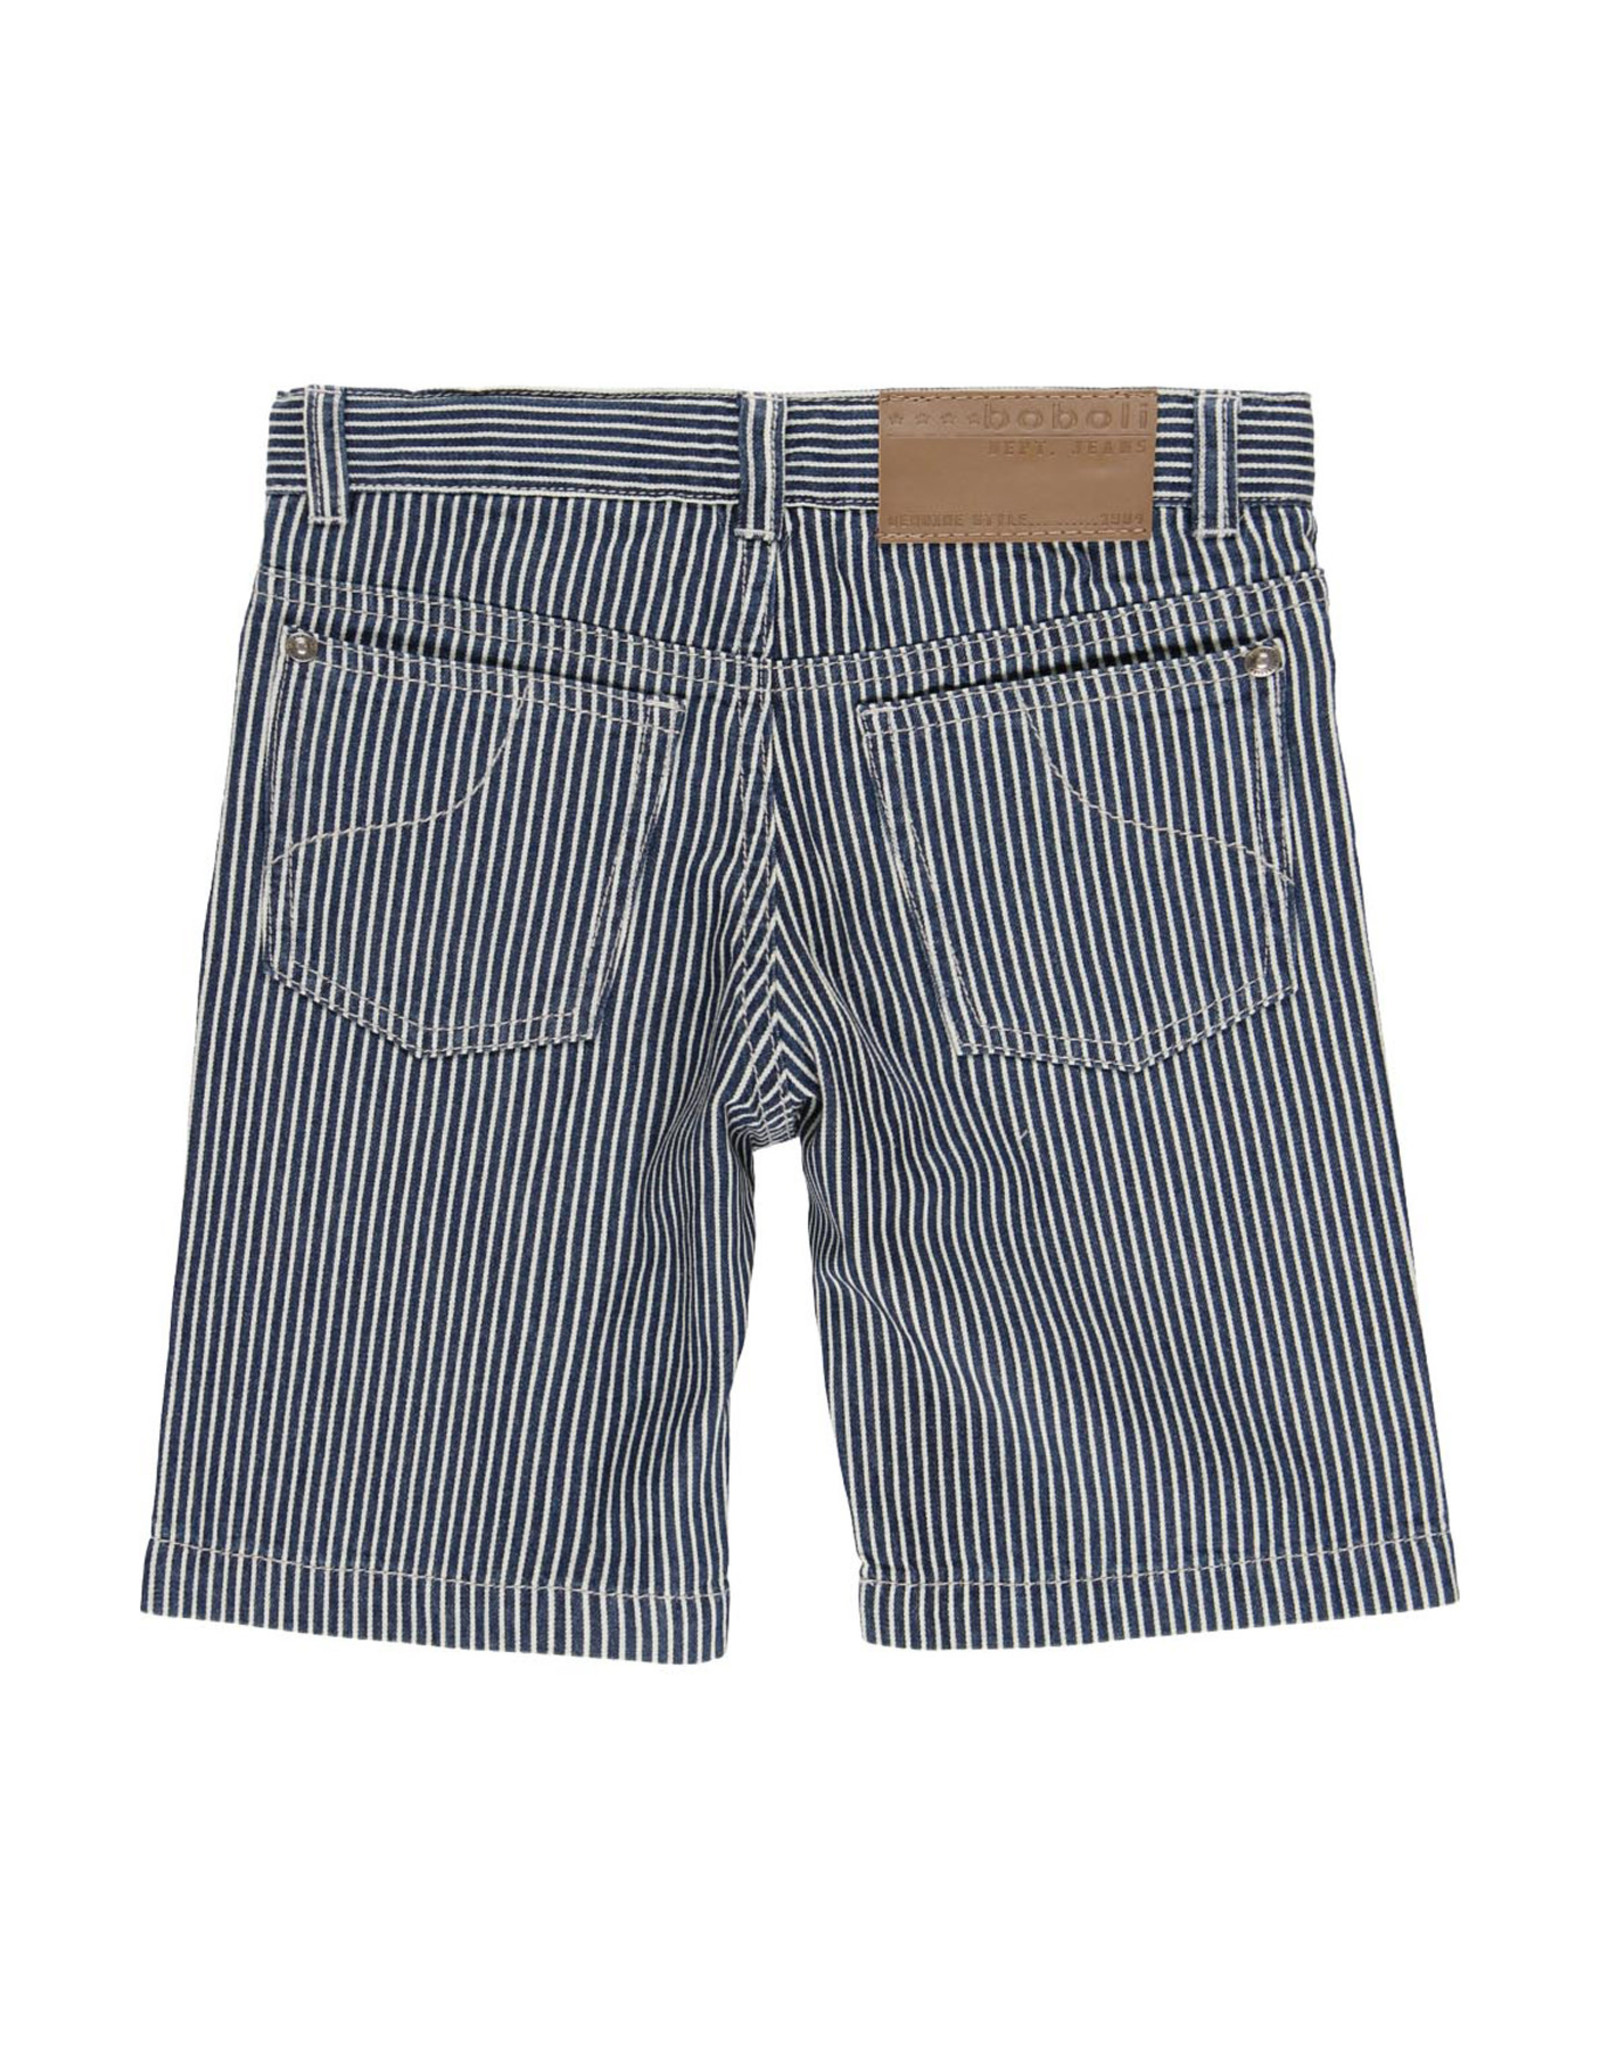 Boboli Striped Bermuda Shorts